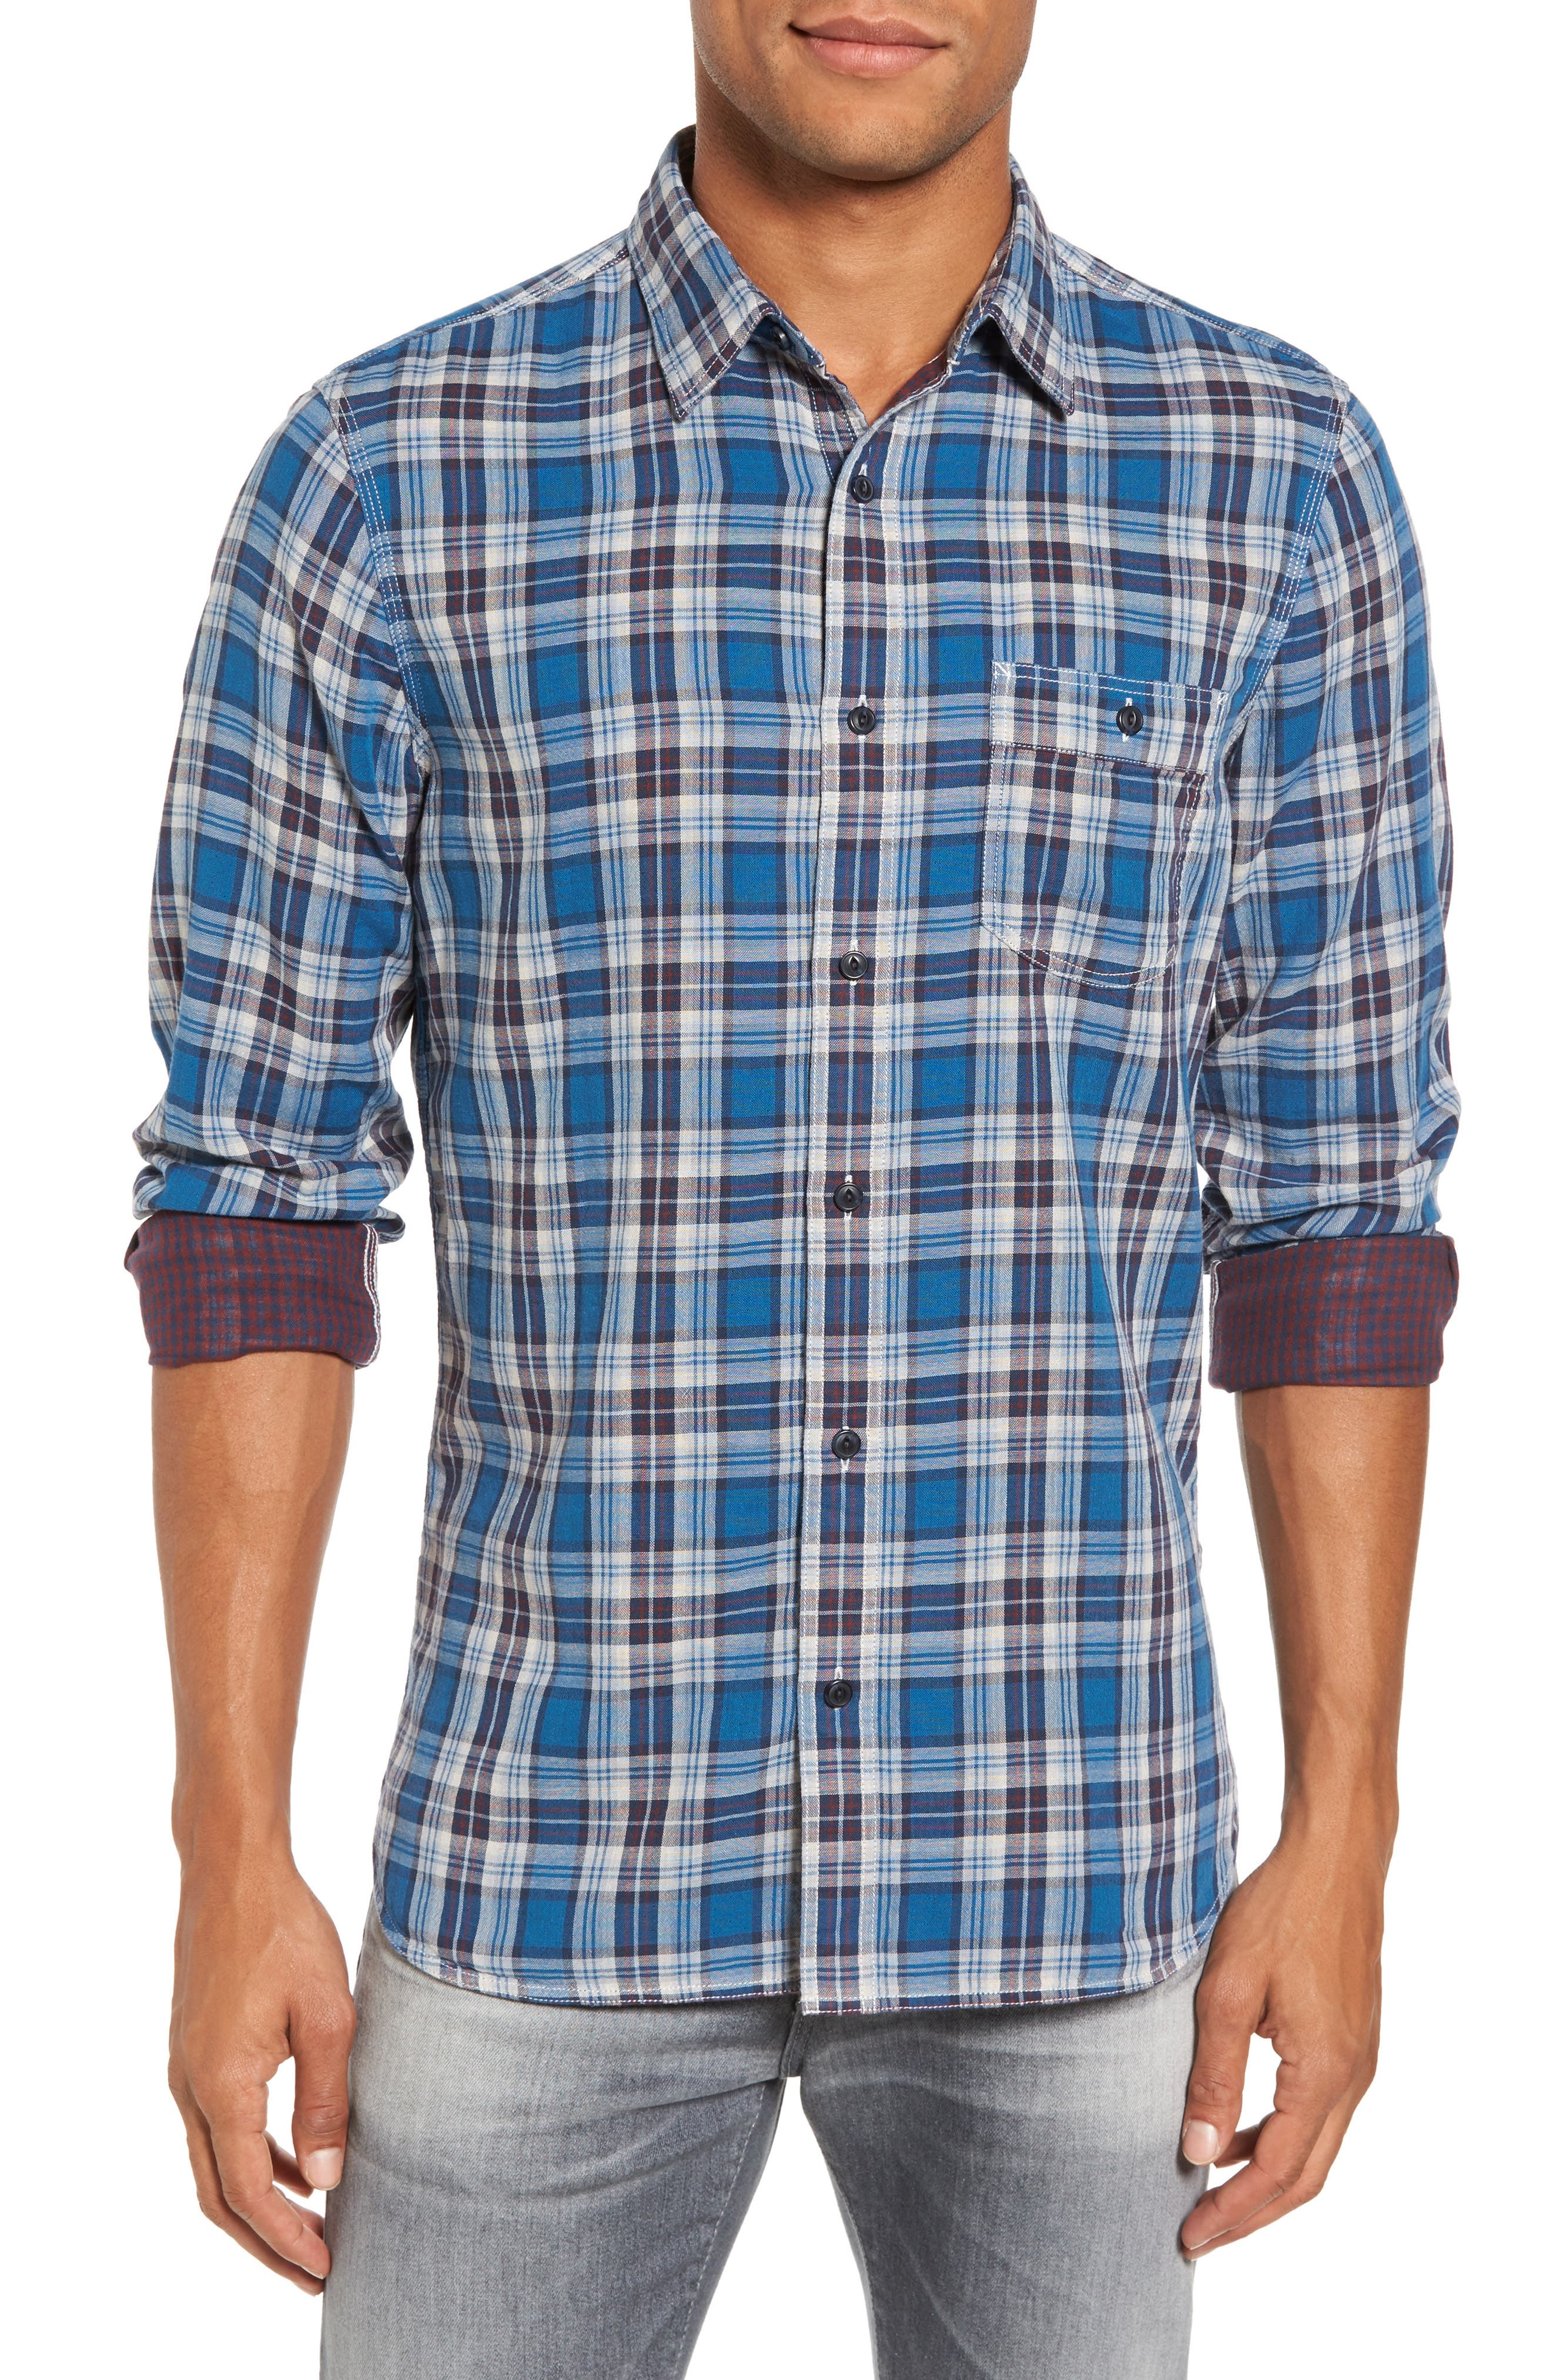 Main Image - Nordstrom Men's Shop Workwear Duofold Plaid Sport Shirt